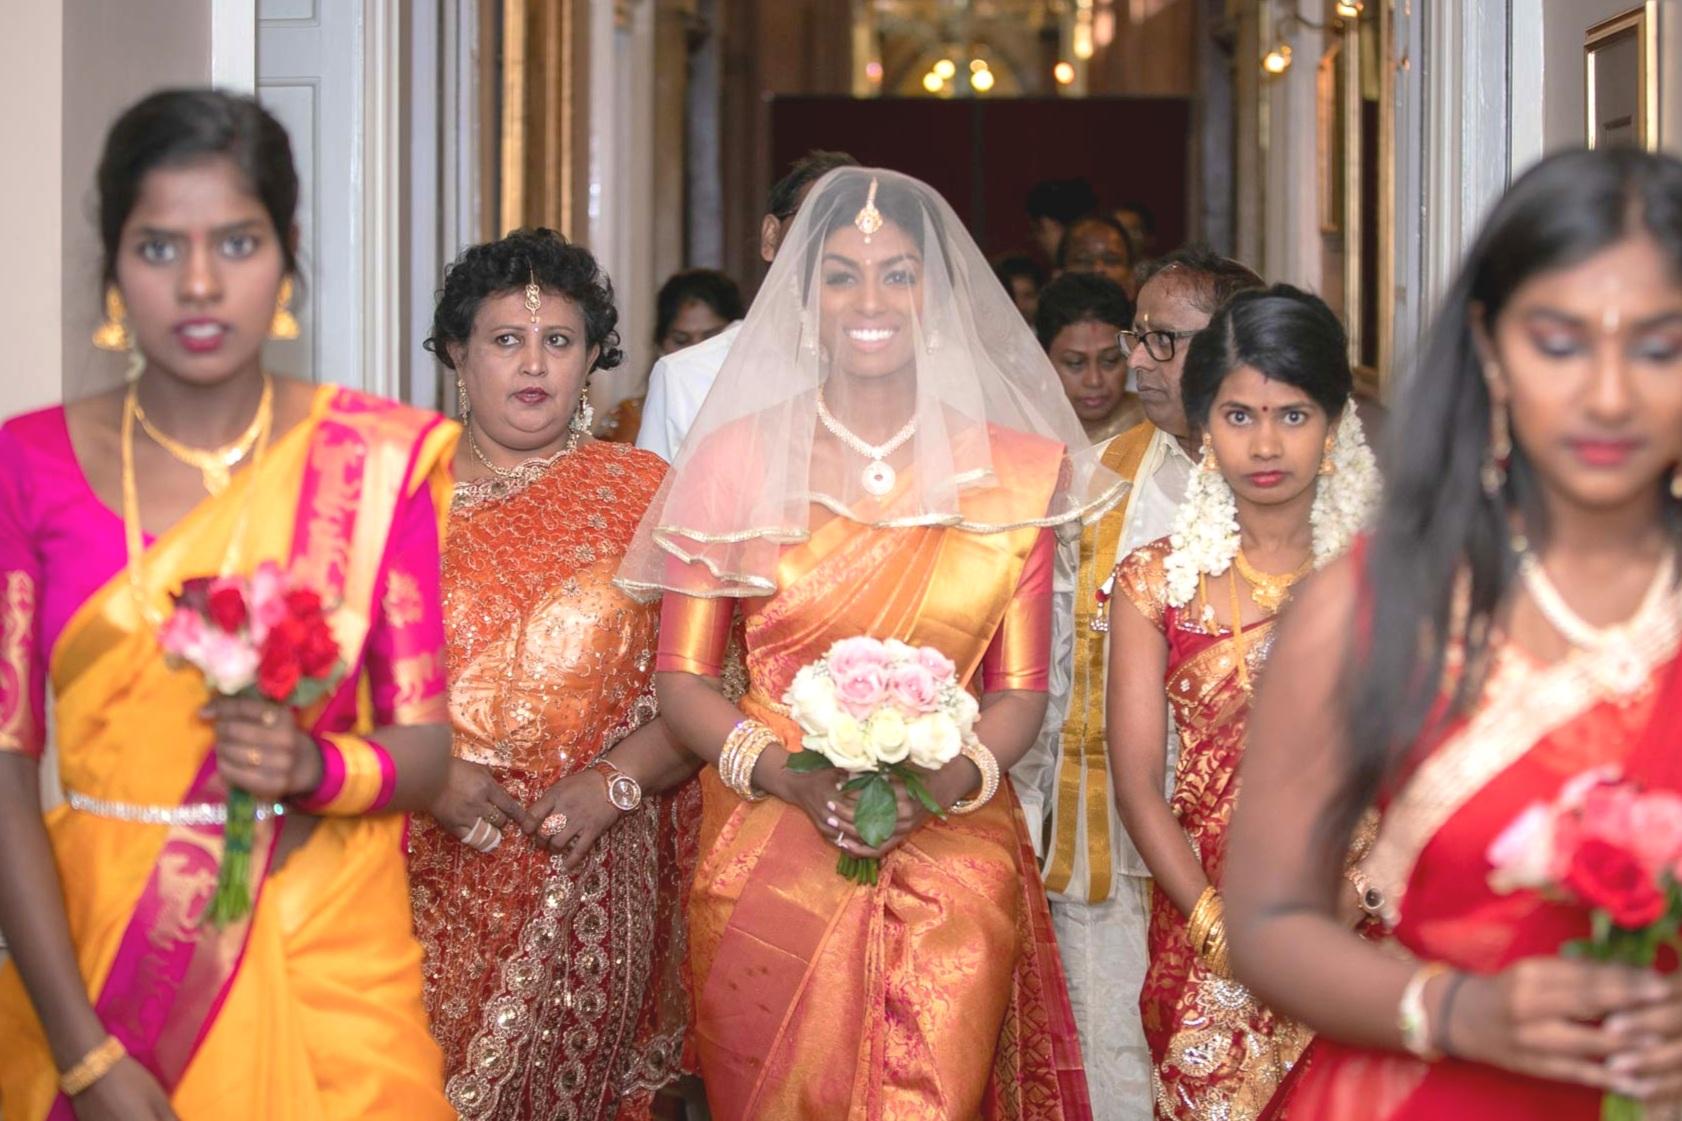 Addington-Palace-Tamil-wedding-photographer-surrey-london.jpg